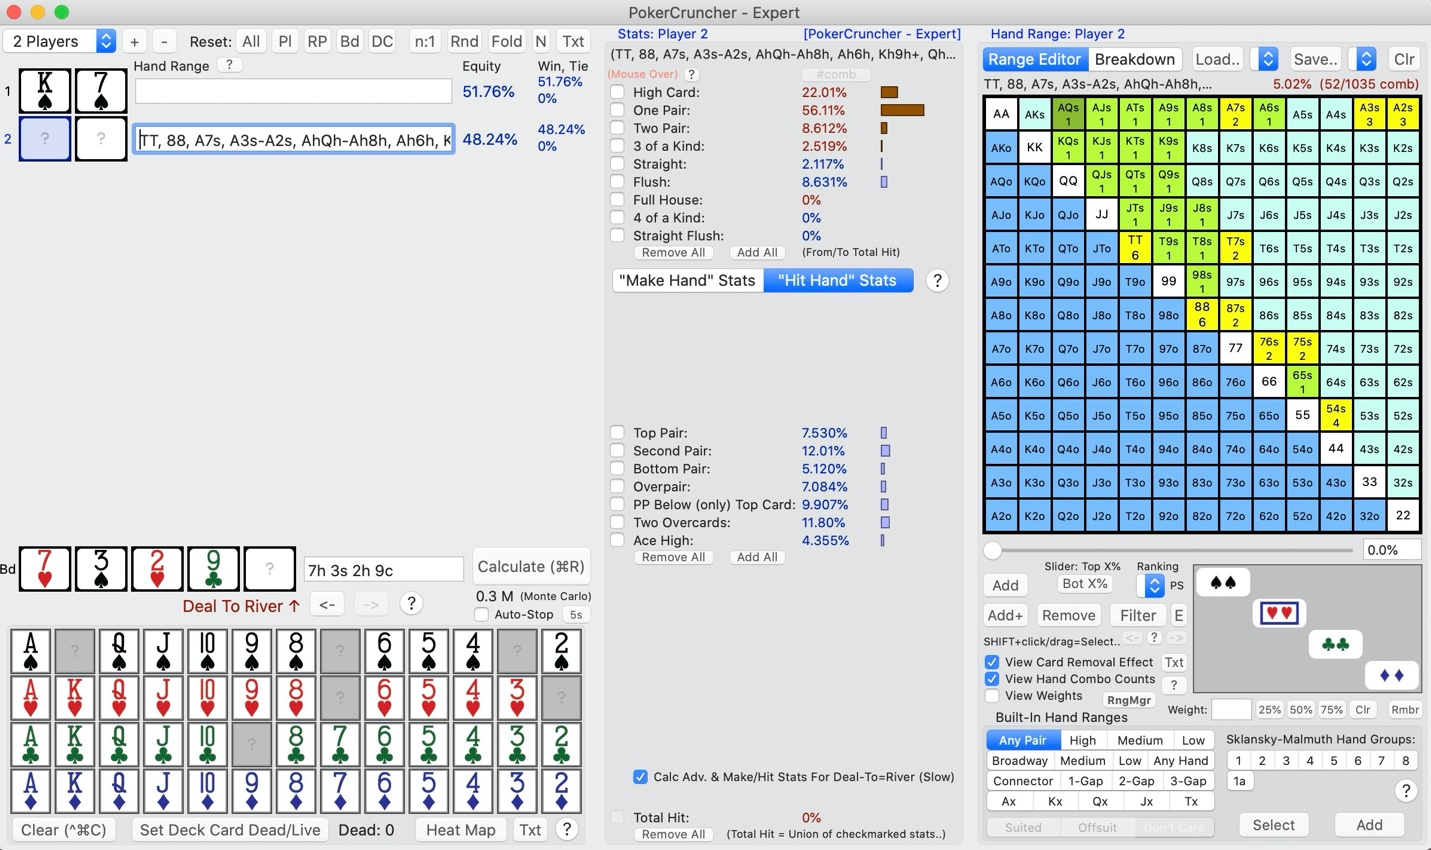 Understanding Equities vs. Ranges on the Turn in Poker 2